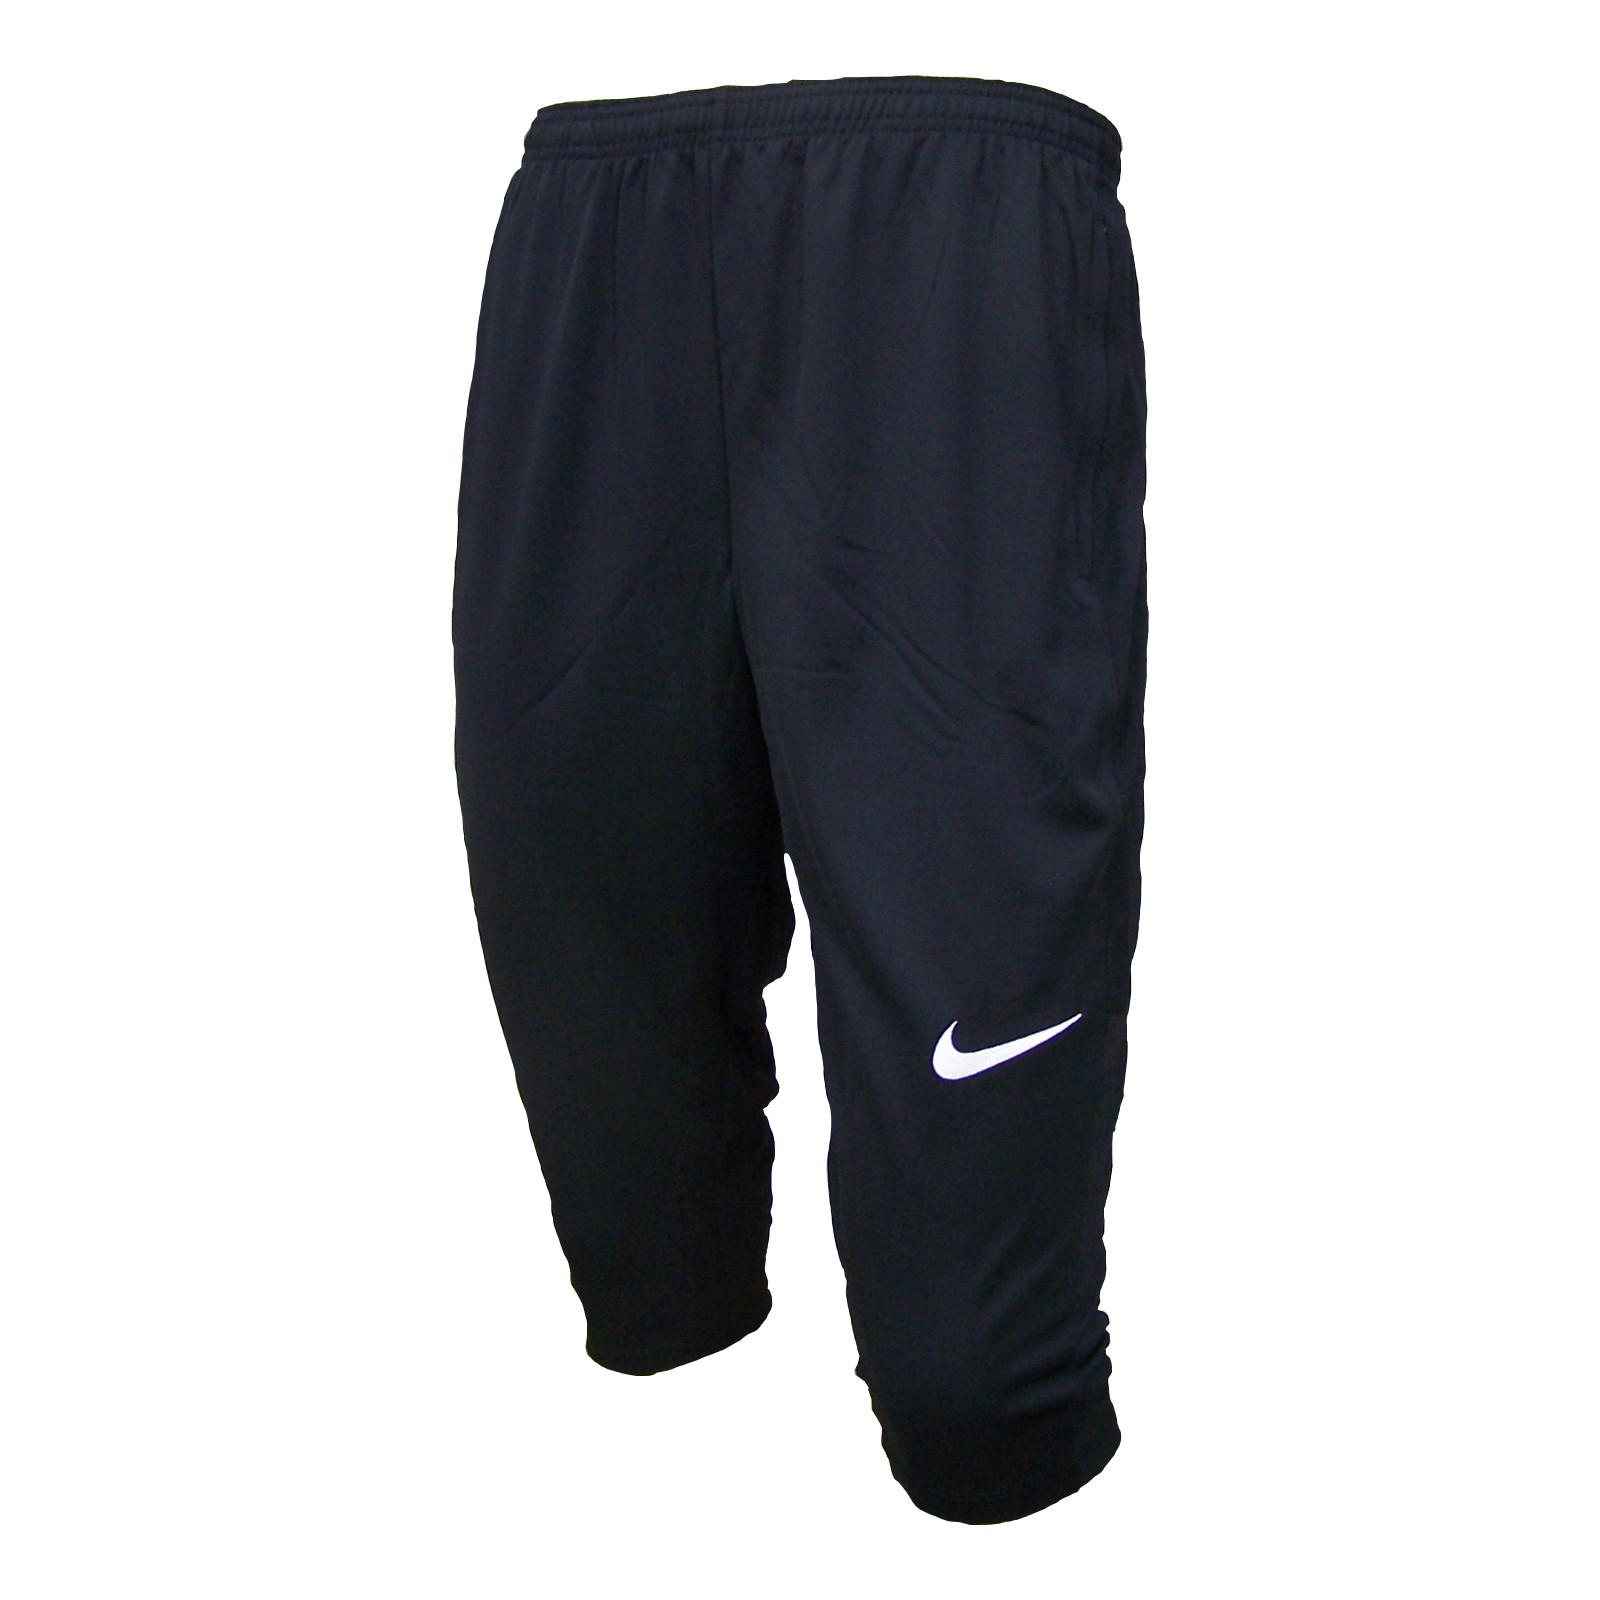 Nike 34 Hose Herren Jogginghose